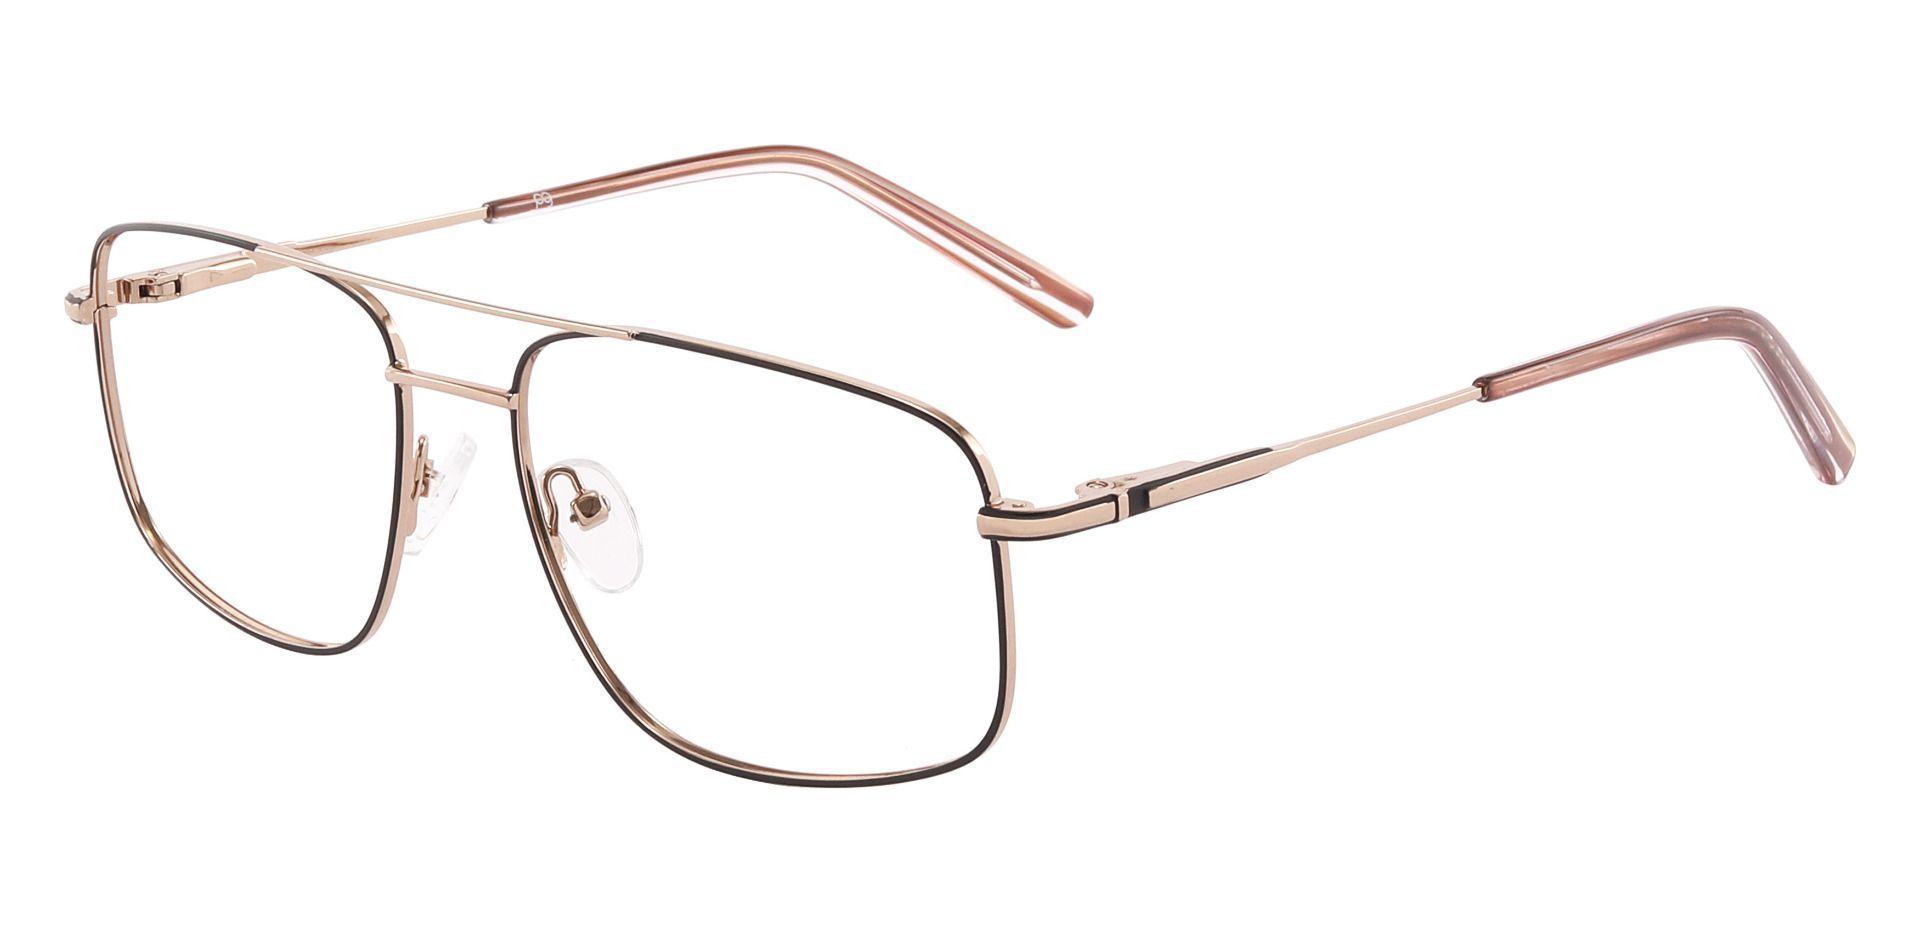 Turner Aviator Prescription Glasses - Gold